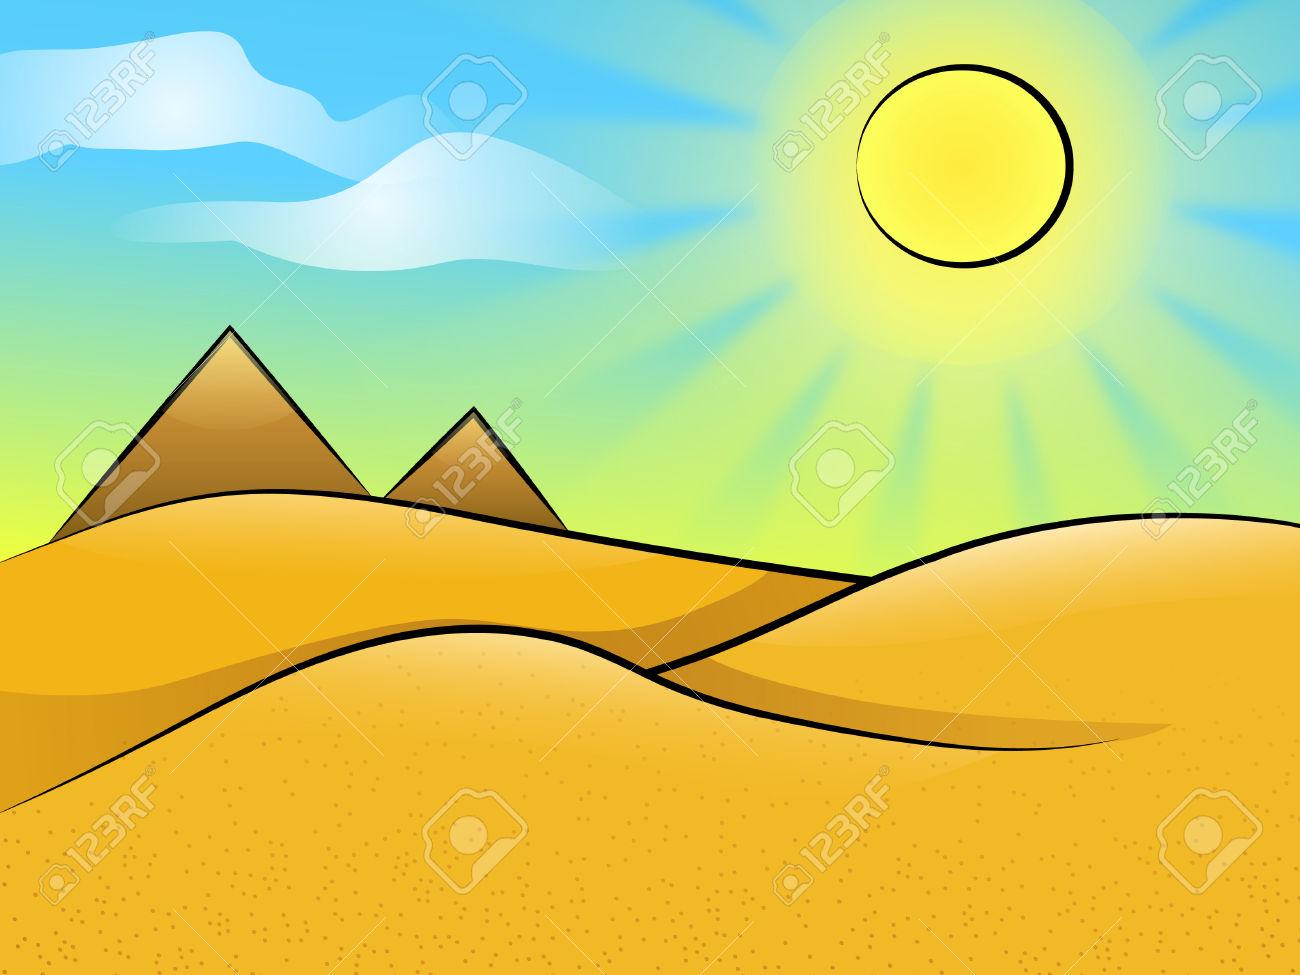 Desert clipart #15, Download drawings